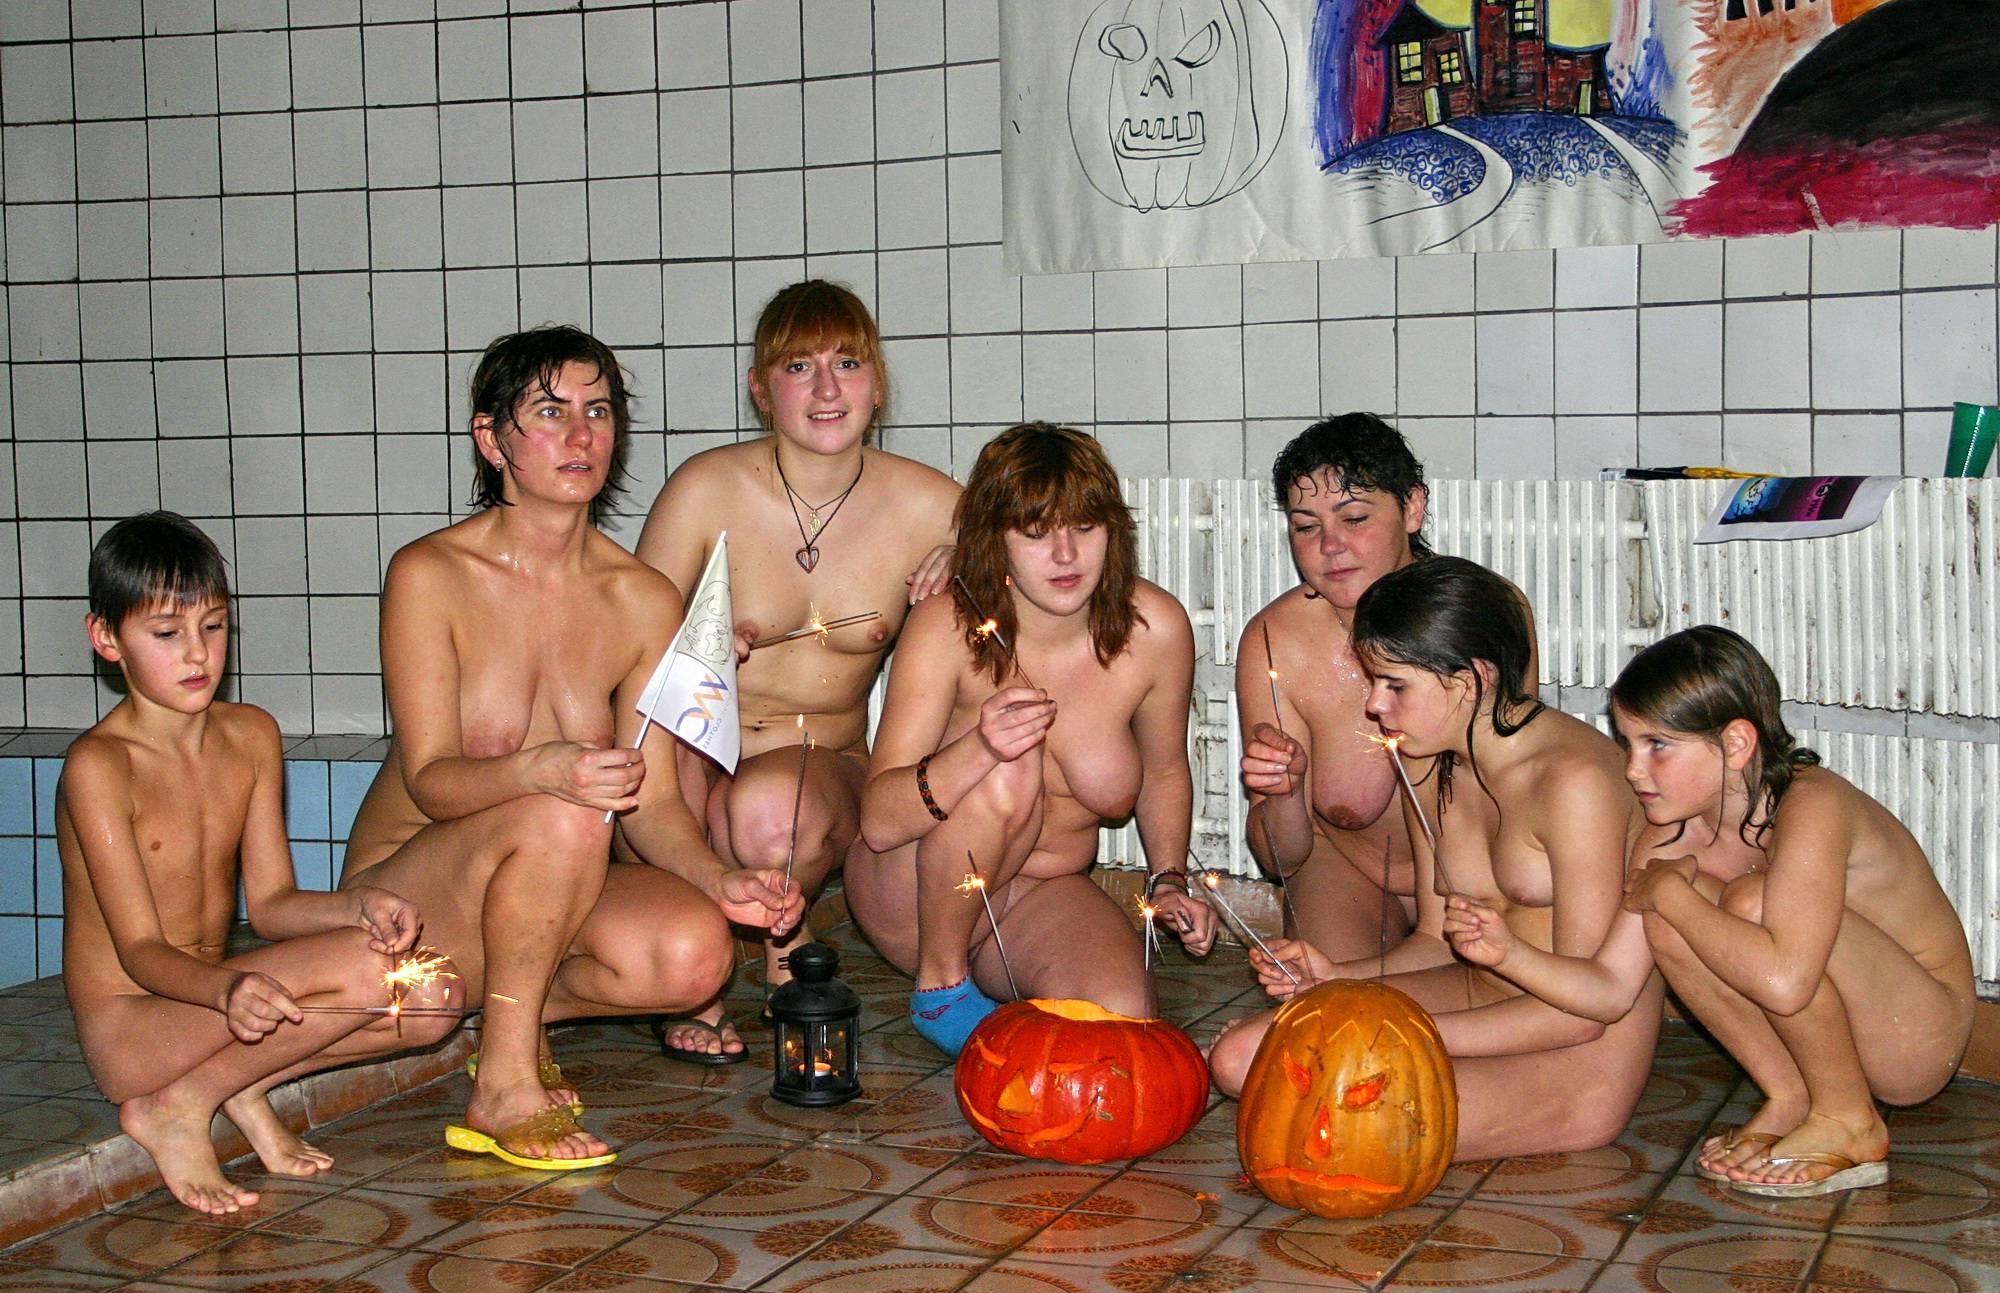 Purenudism Pics-Halloween Party Overview - 1